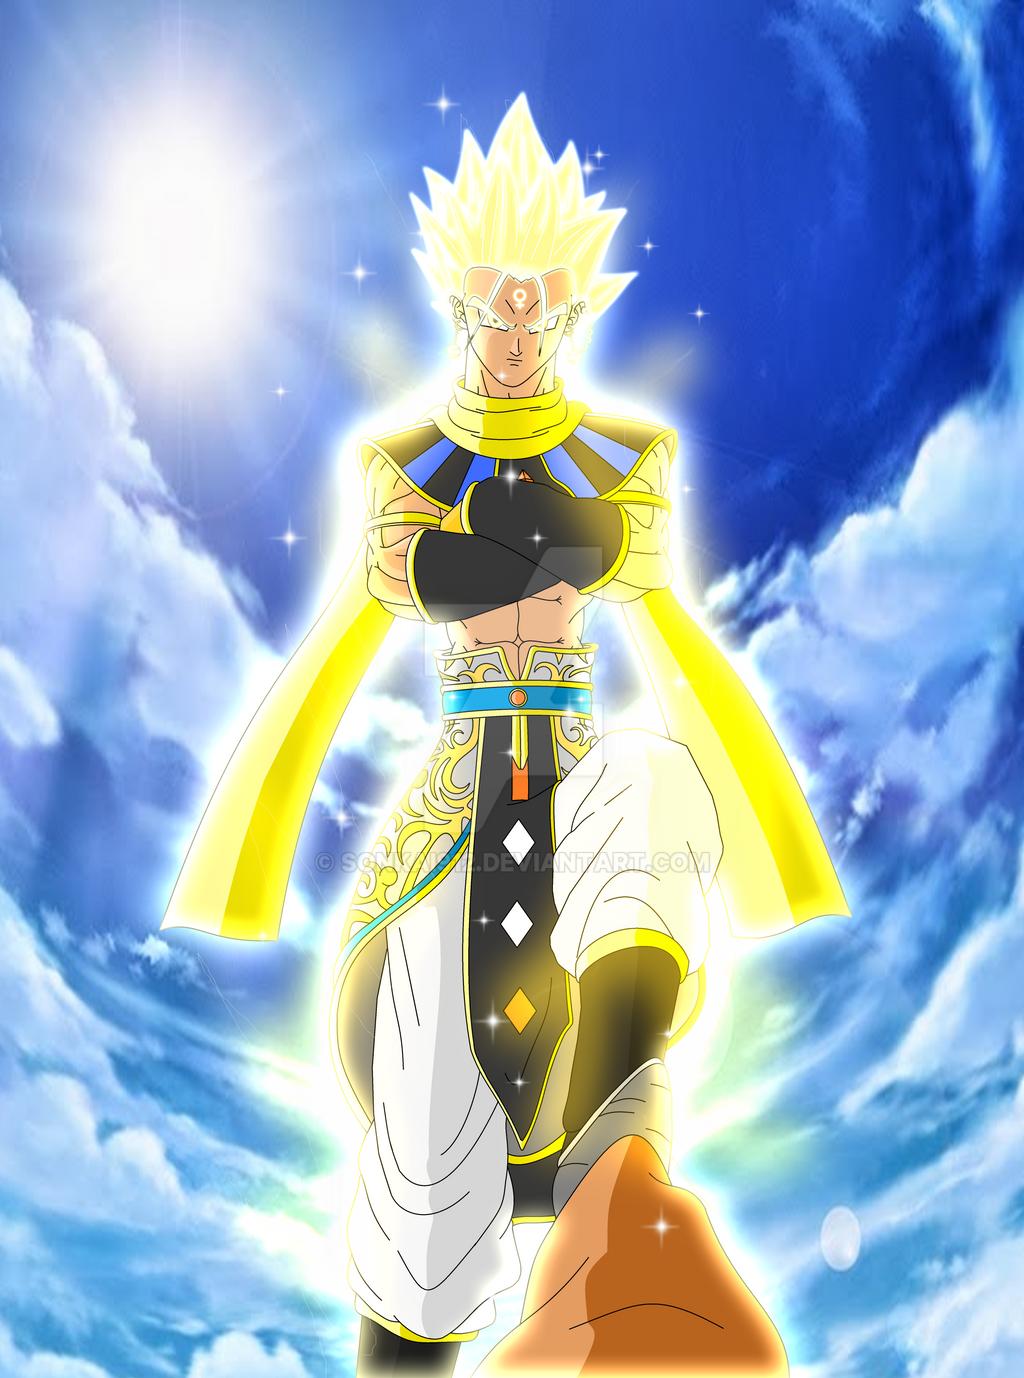 Kai-Lan God form by Sonkai912 on DeviantArt